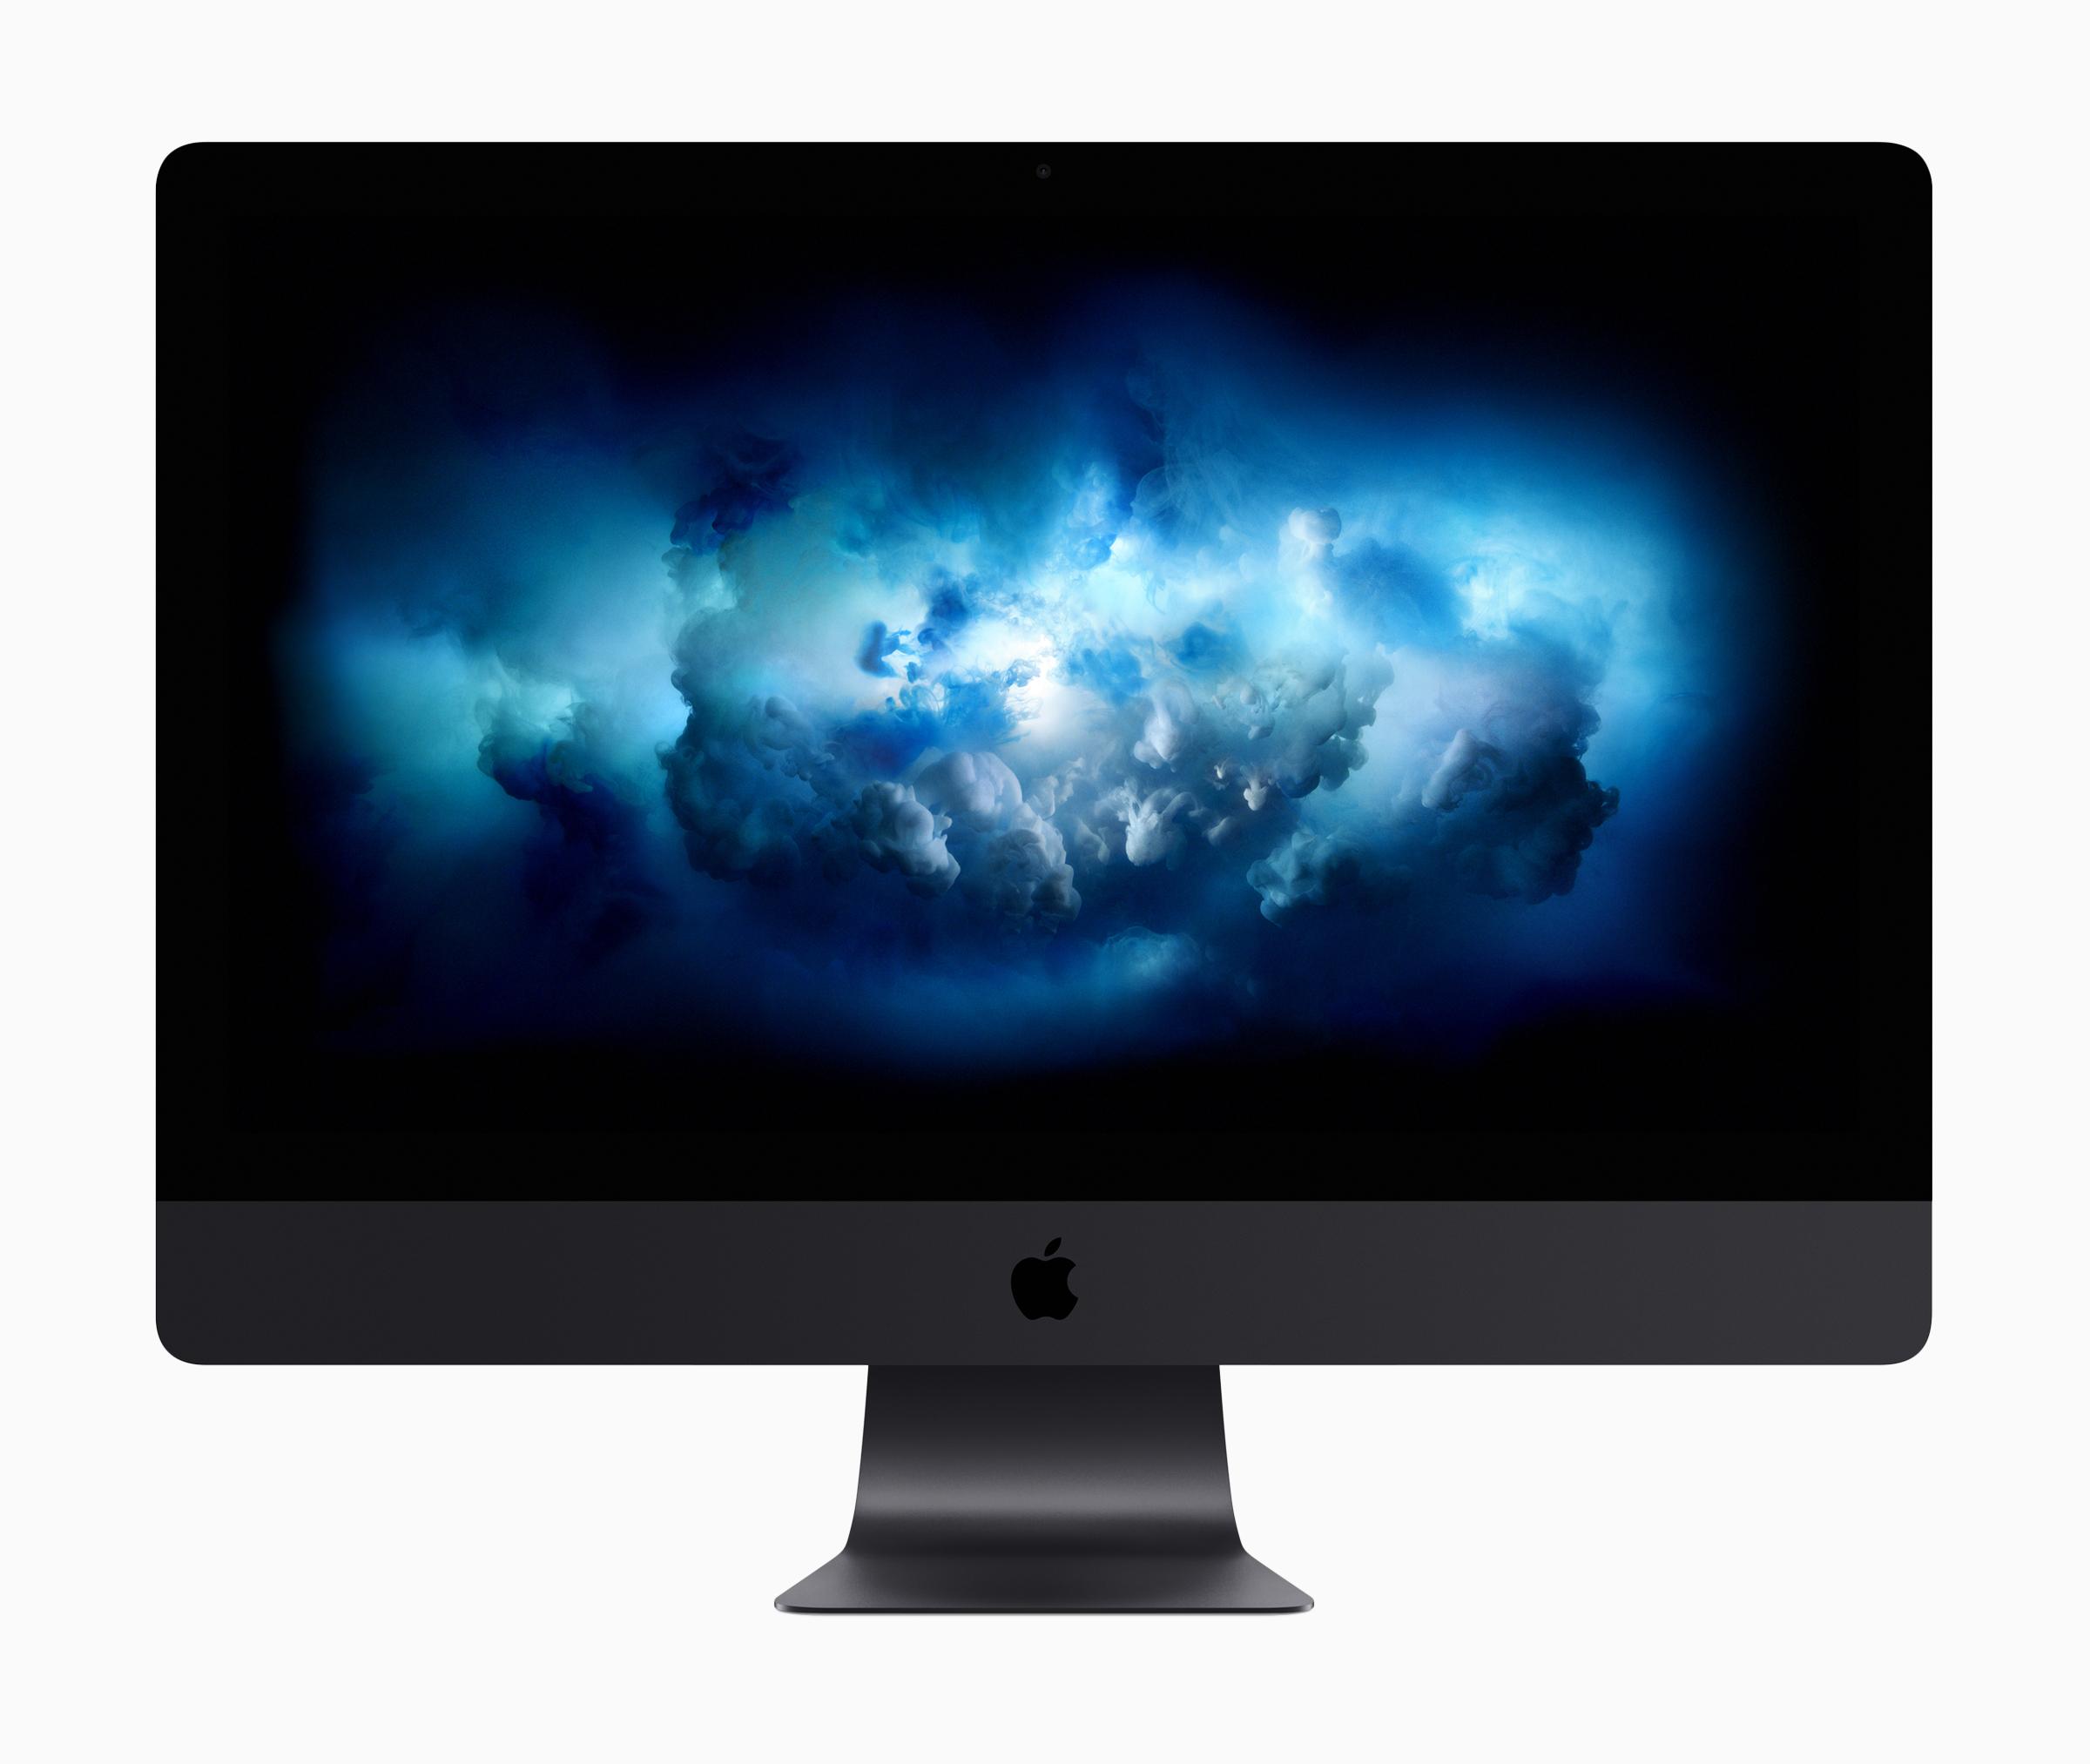 Upcoming iMac Pro